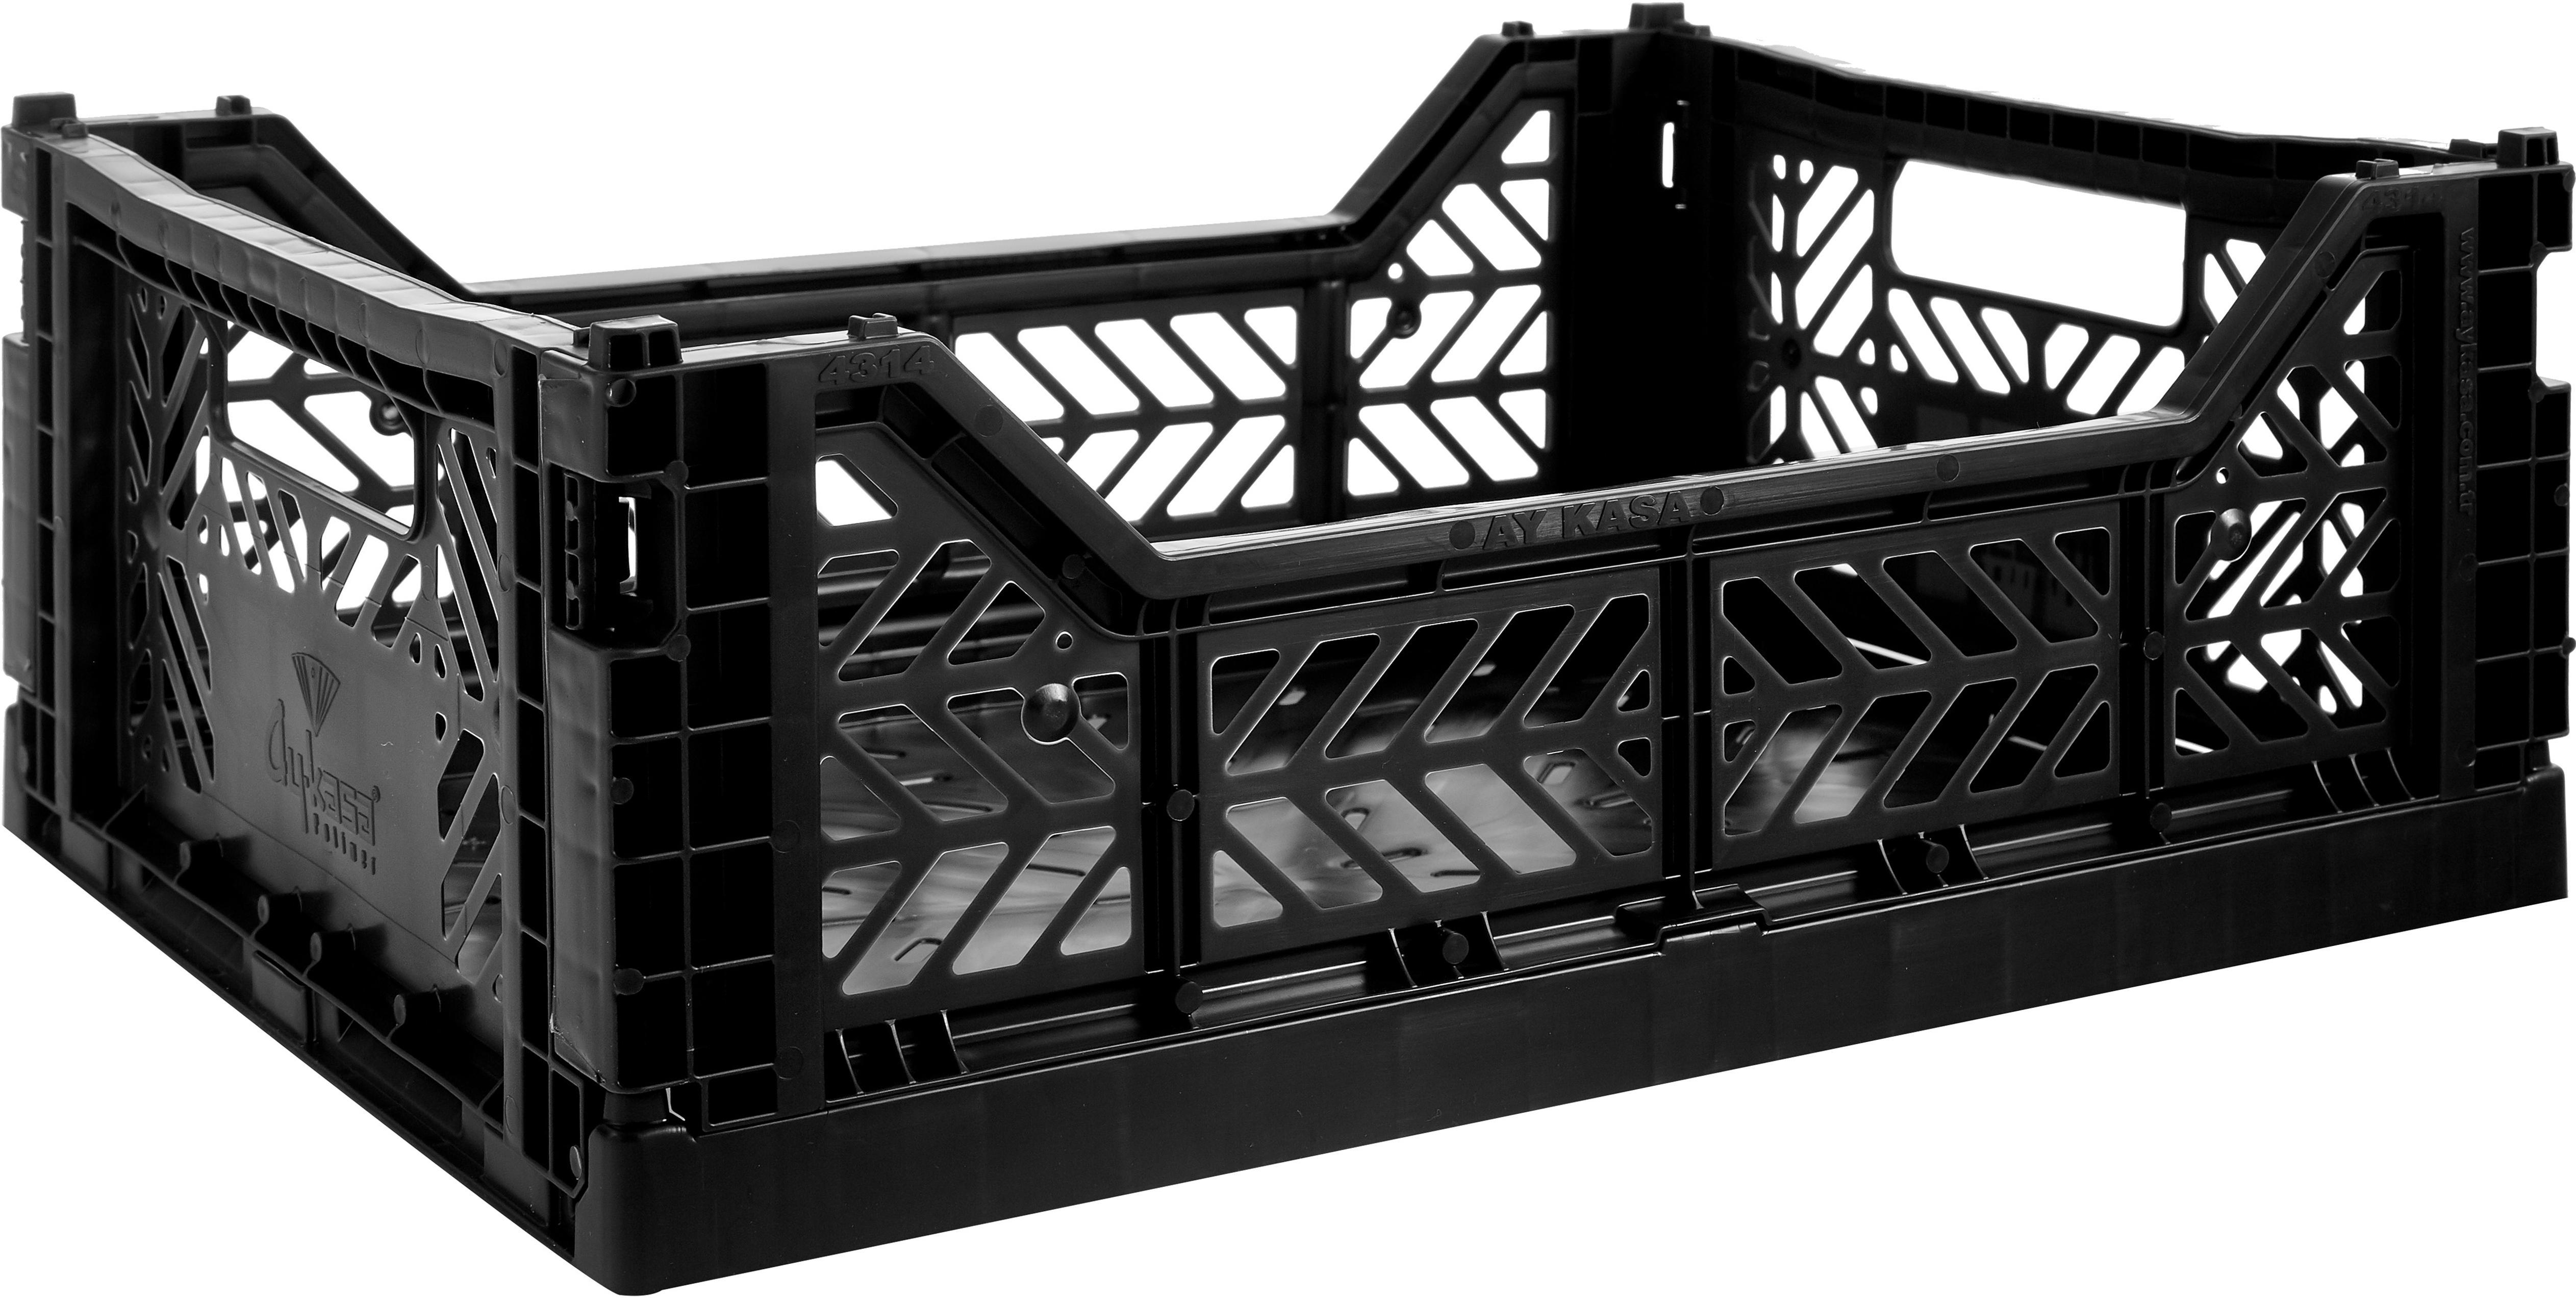 Klappkiste Black, stapelbar, medium, Recycelter Kunststoff, Schwarz, 40 x 14 cm